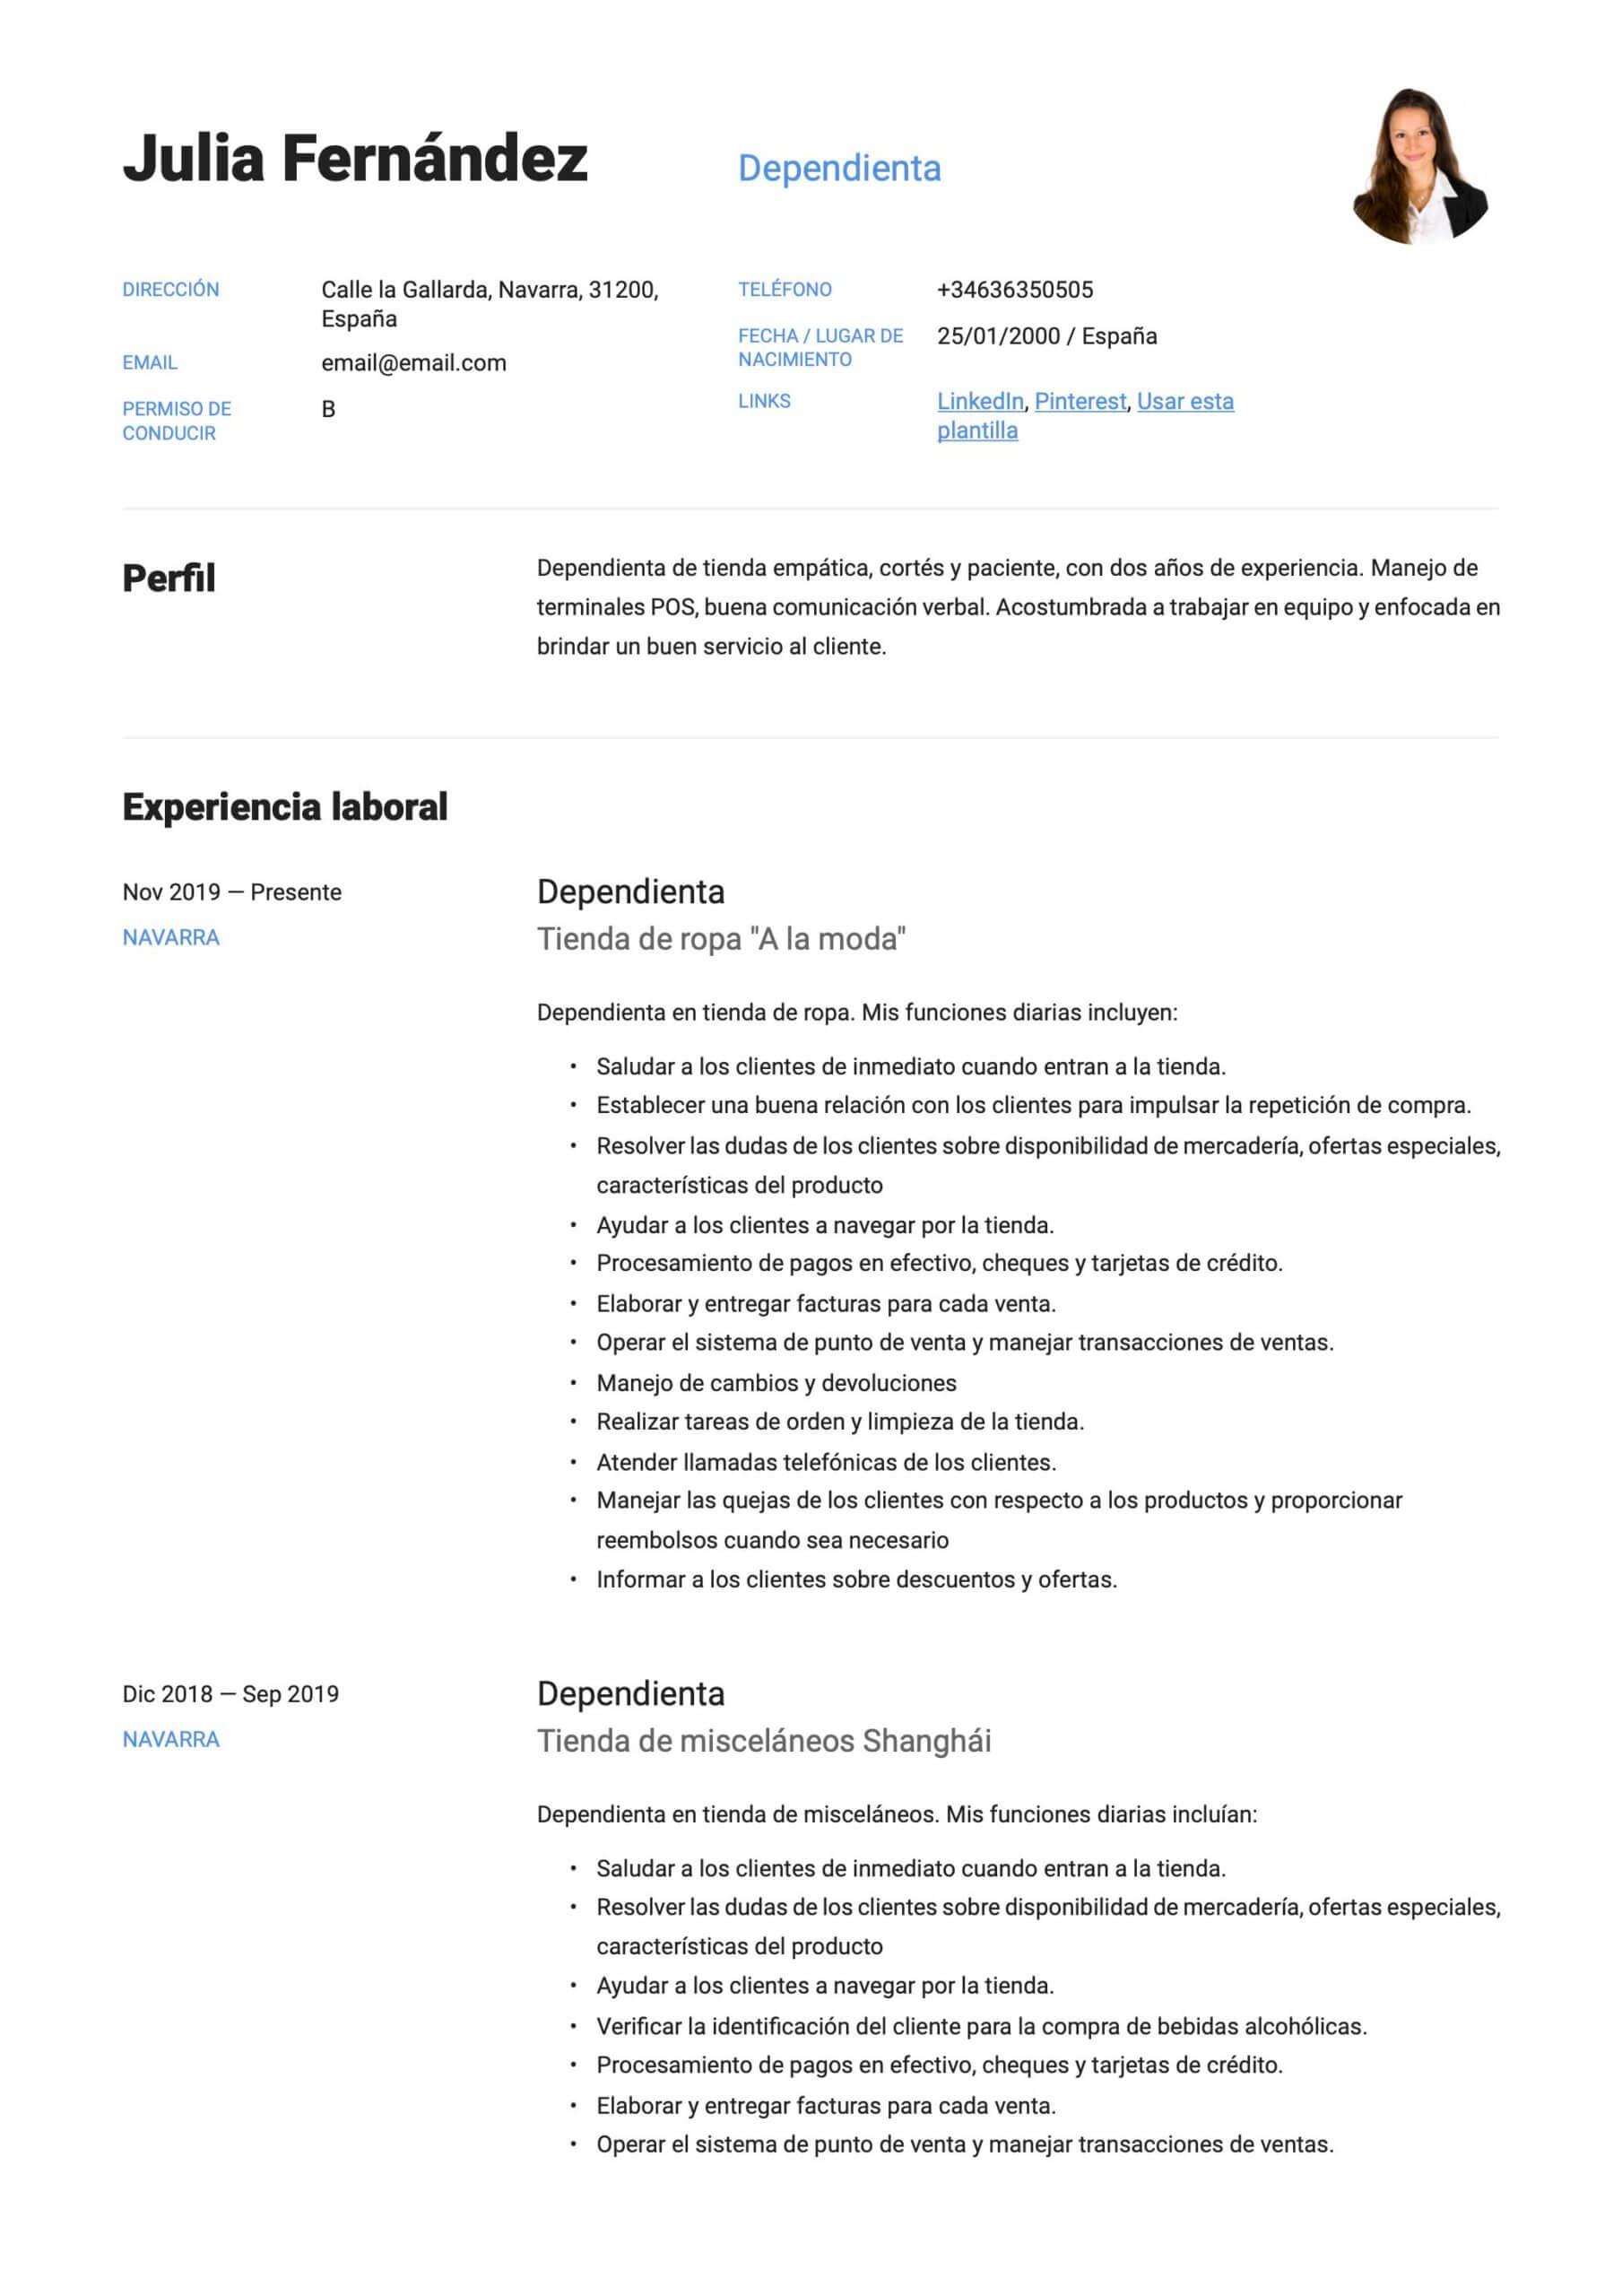 Modelo de CV para Dependienta